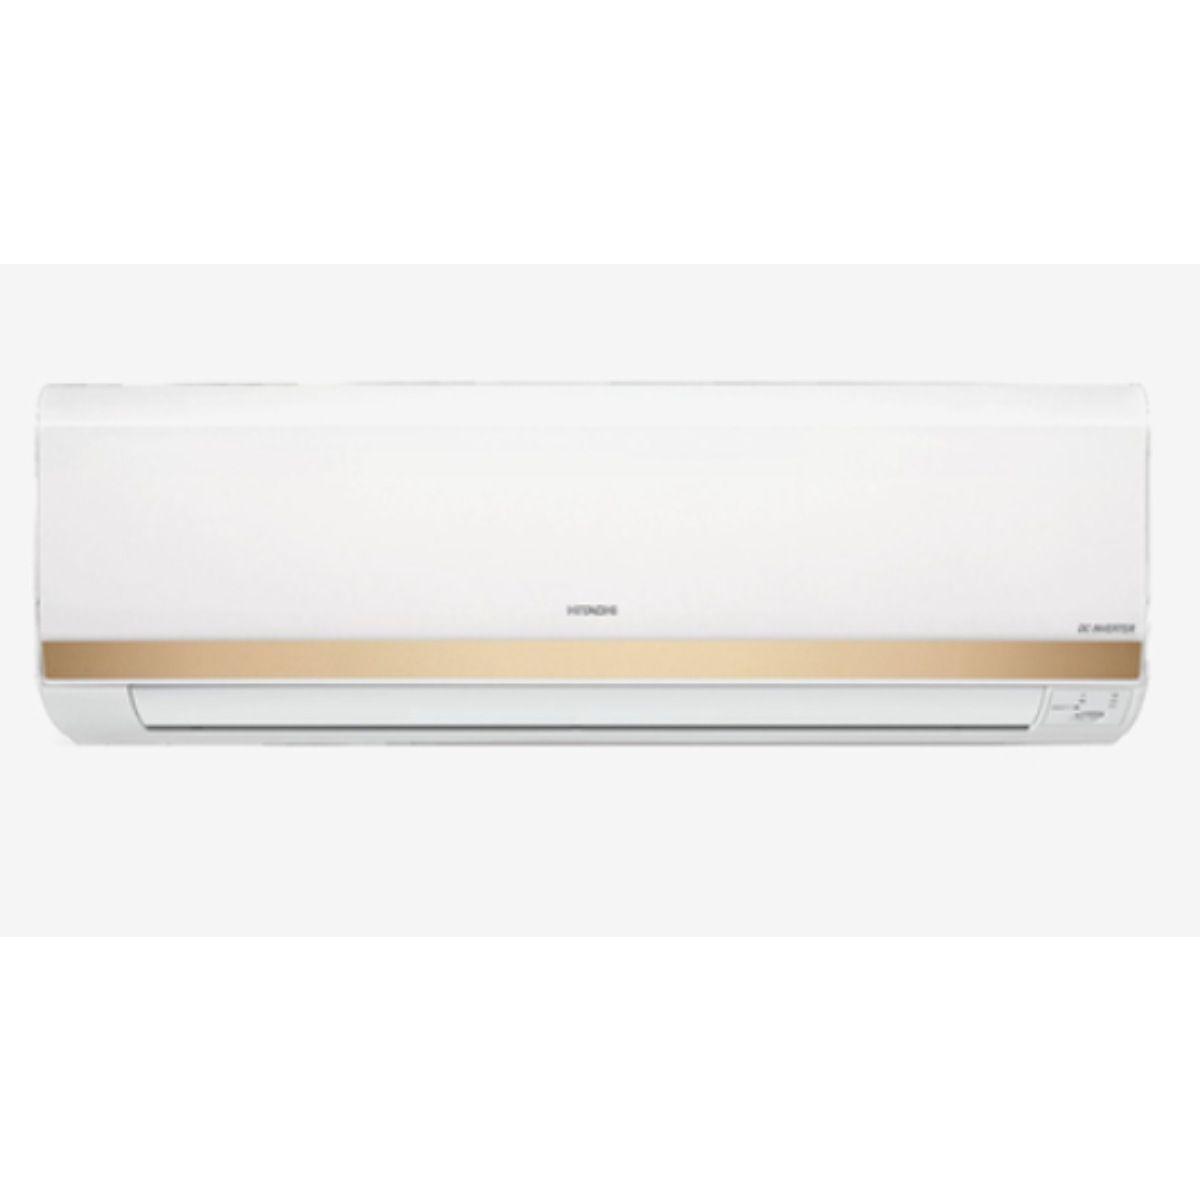 हिताची 1.5 Ton 3 Star Inverter Split Air Conditioner(RSOG317ICEA)